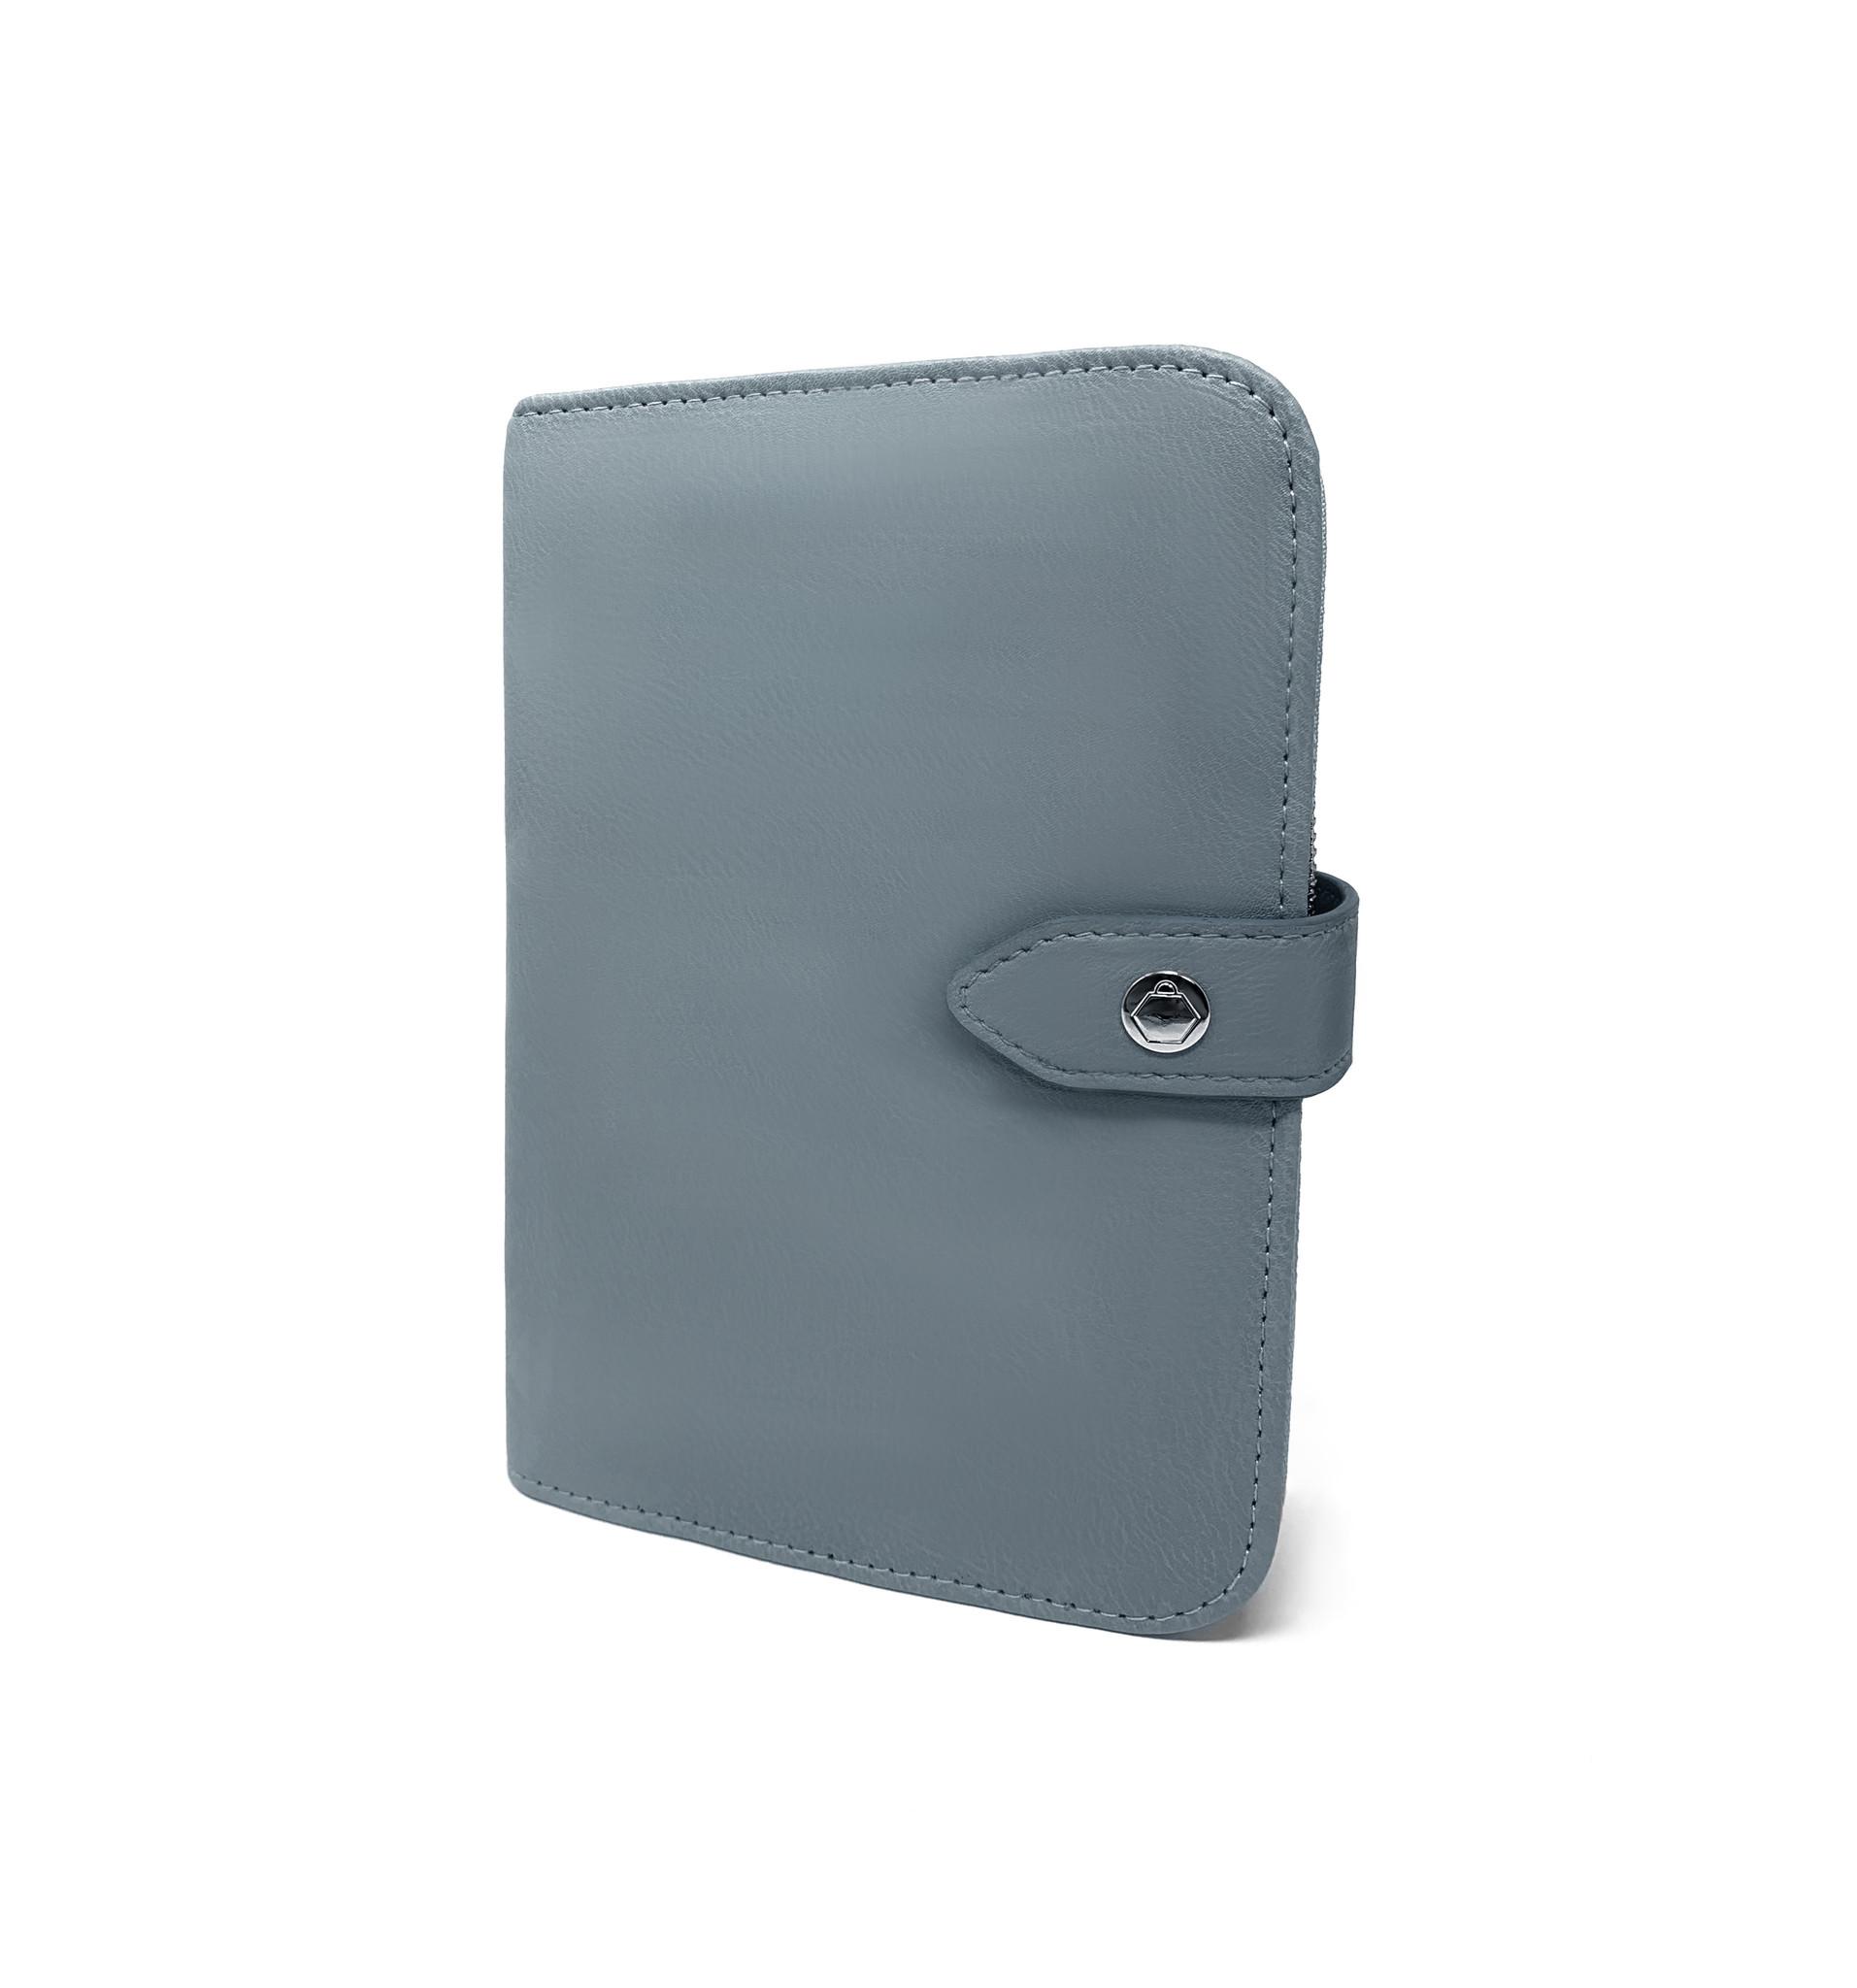 SCOLA Organizer  - Soft Blue PRE-SALE-1